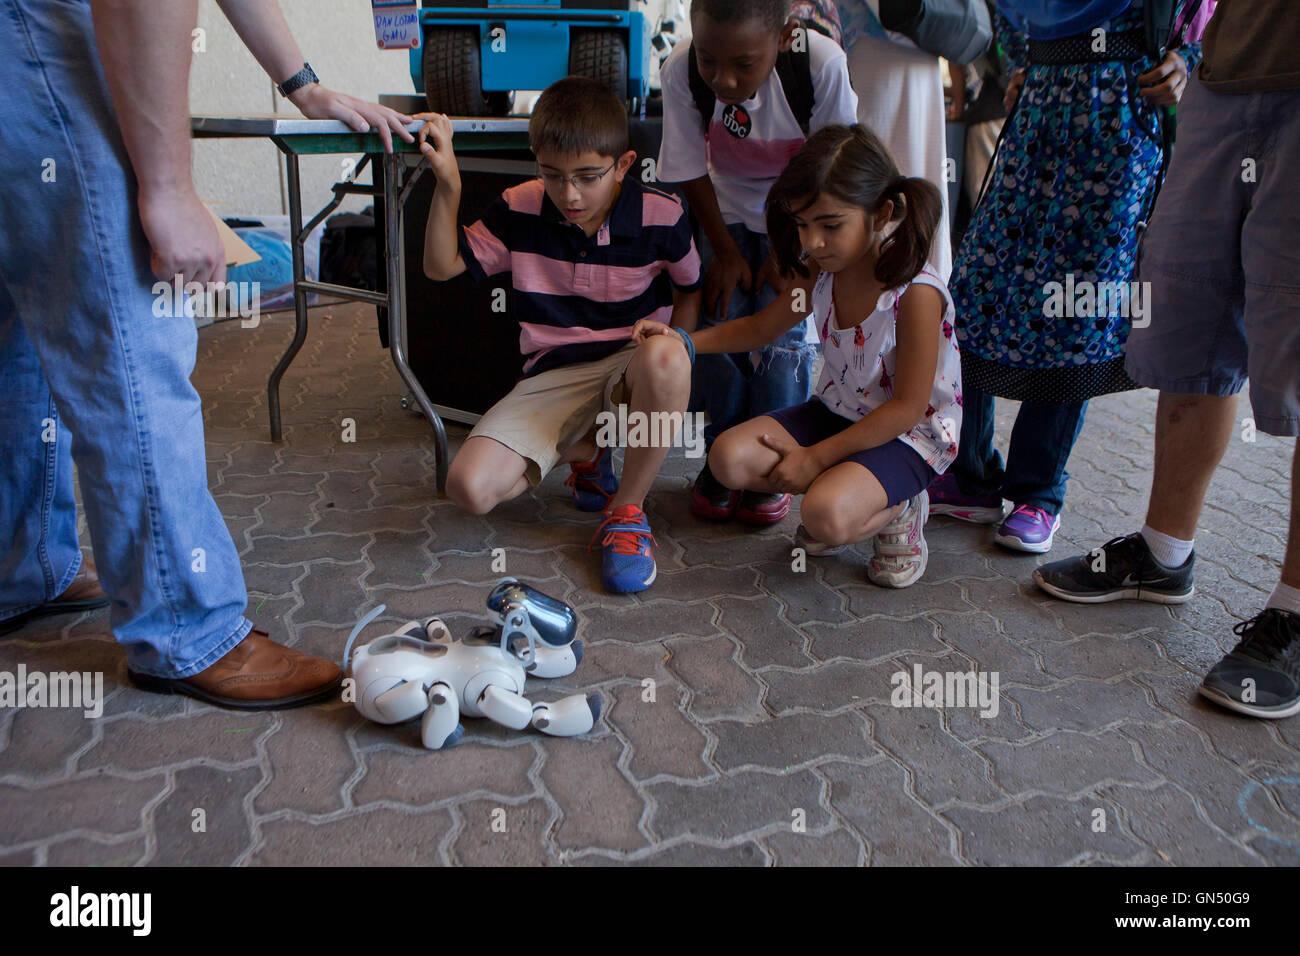 Schoolchildren learning about  robotics at Maker Faire - Washington, DC USA Stock Photo